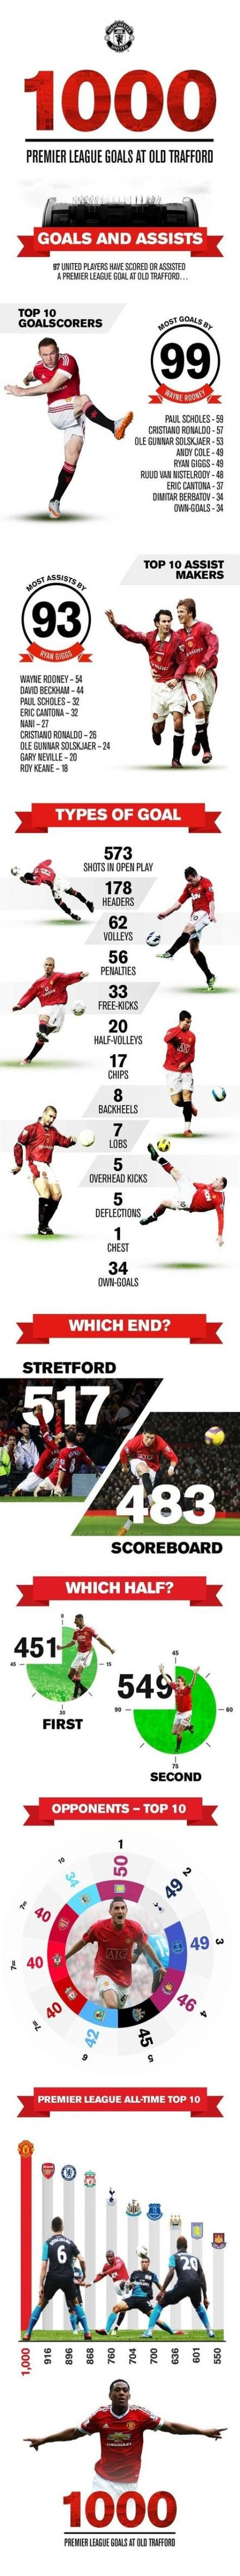 List of Great Manchester United Wallpapers 2019 Sport Wallpaper Soccer Galleries 34 Super Ideas